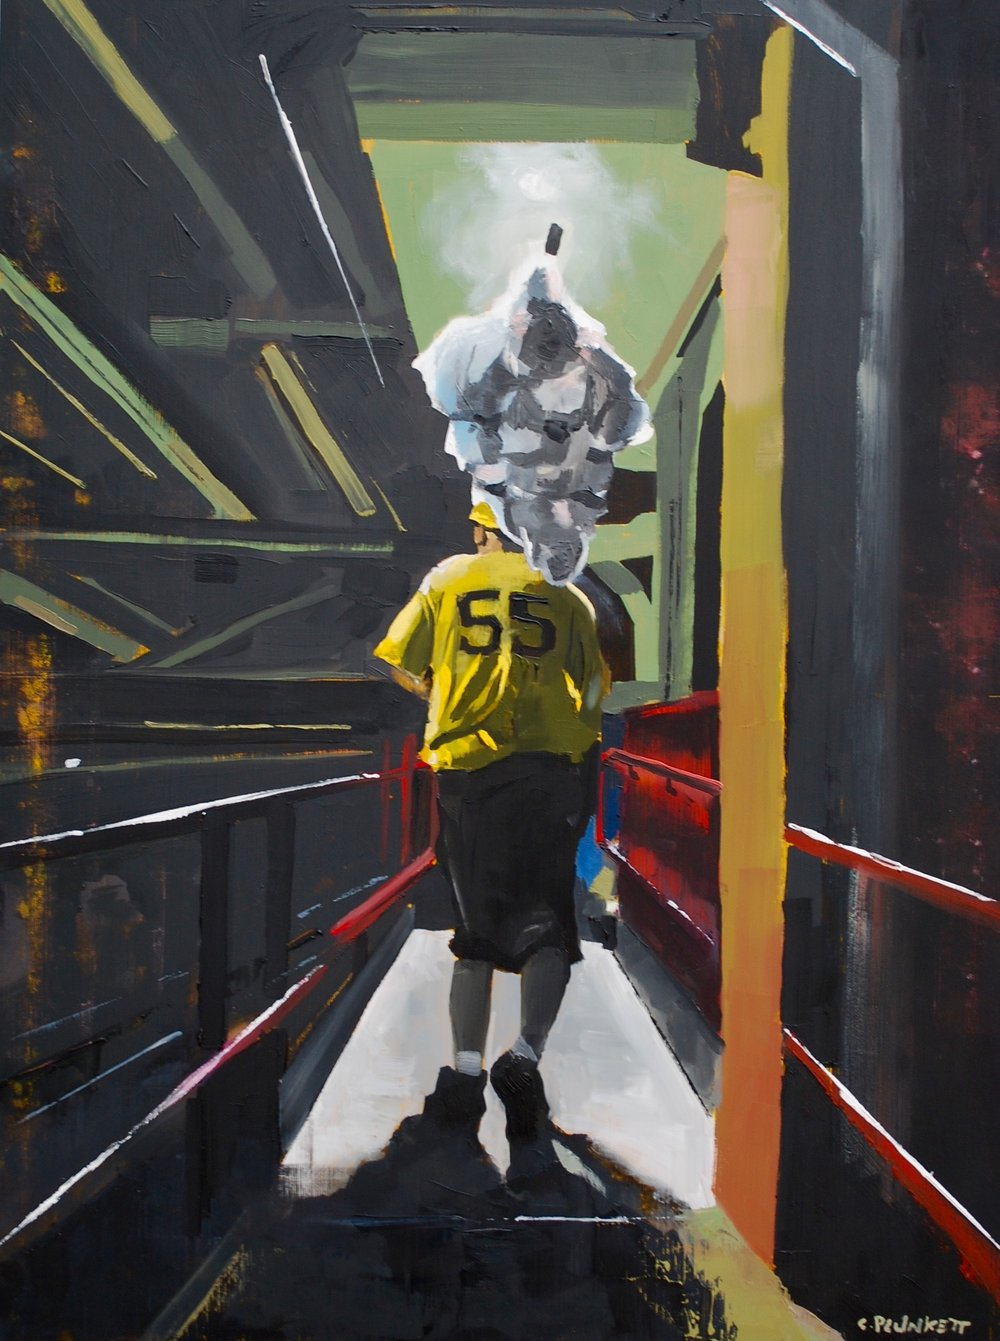 """WIlbanks"" by Chris Plunkett"